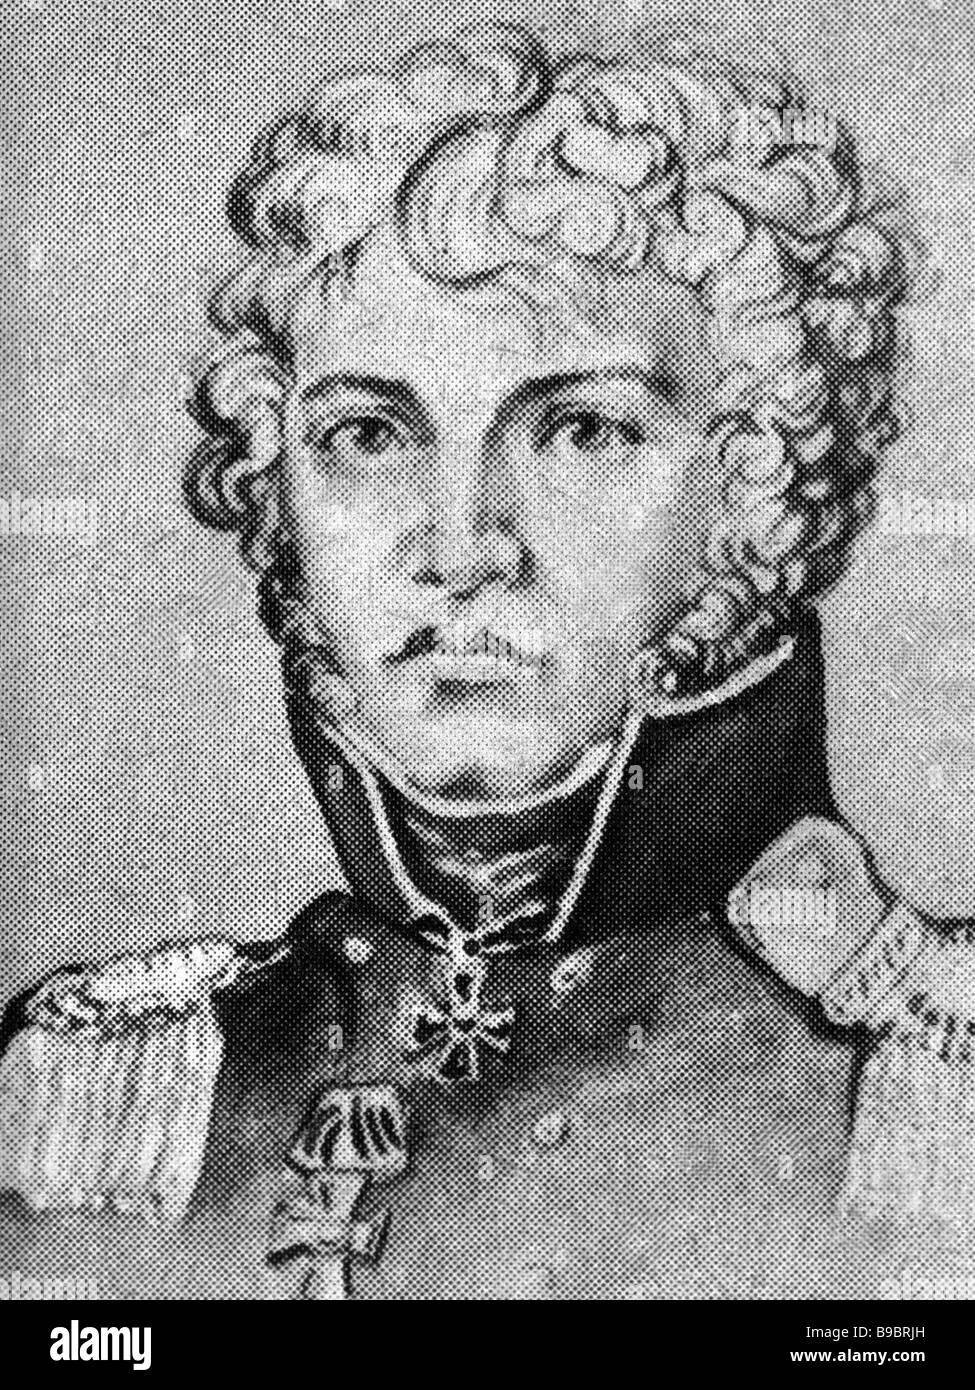 A portrait copy of seafarer Yuri Lisyansky who together with Ivan Kruzenshtern circumnavigated the globe - Stock Image